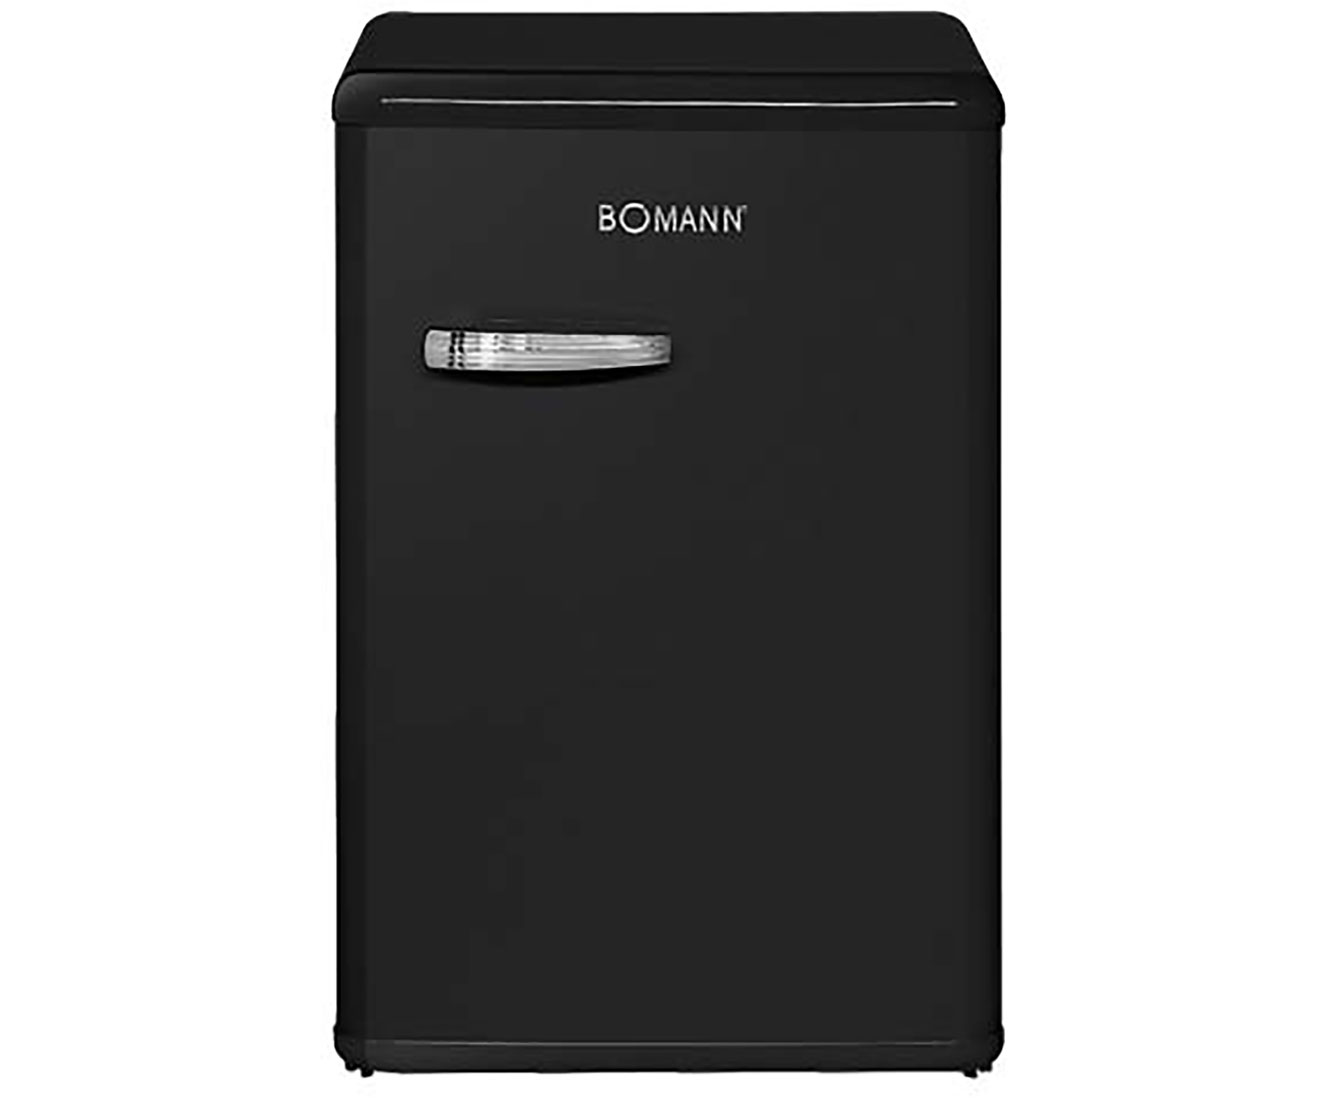 Bomann Kühlschrank Bewertung : Bomann kg kühl gefrierkombination kühlschrank gefrierschrank